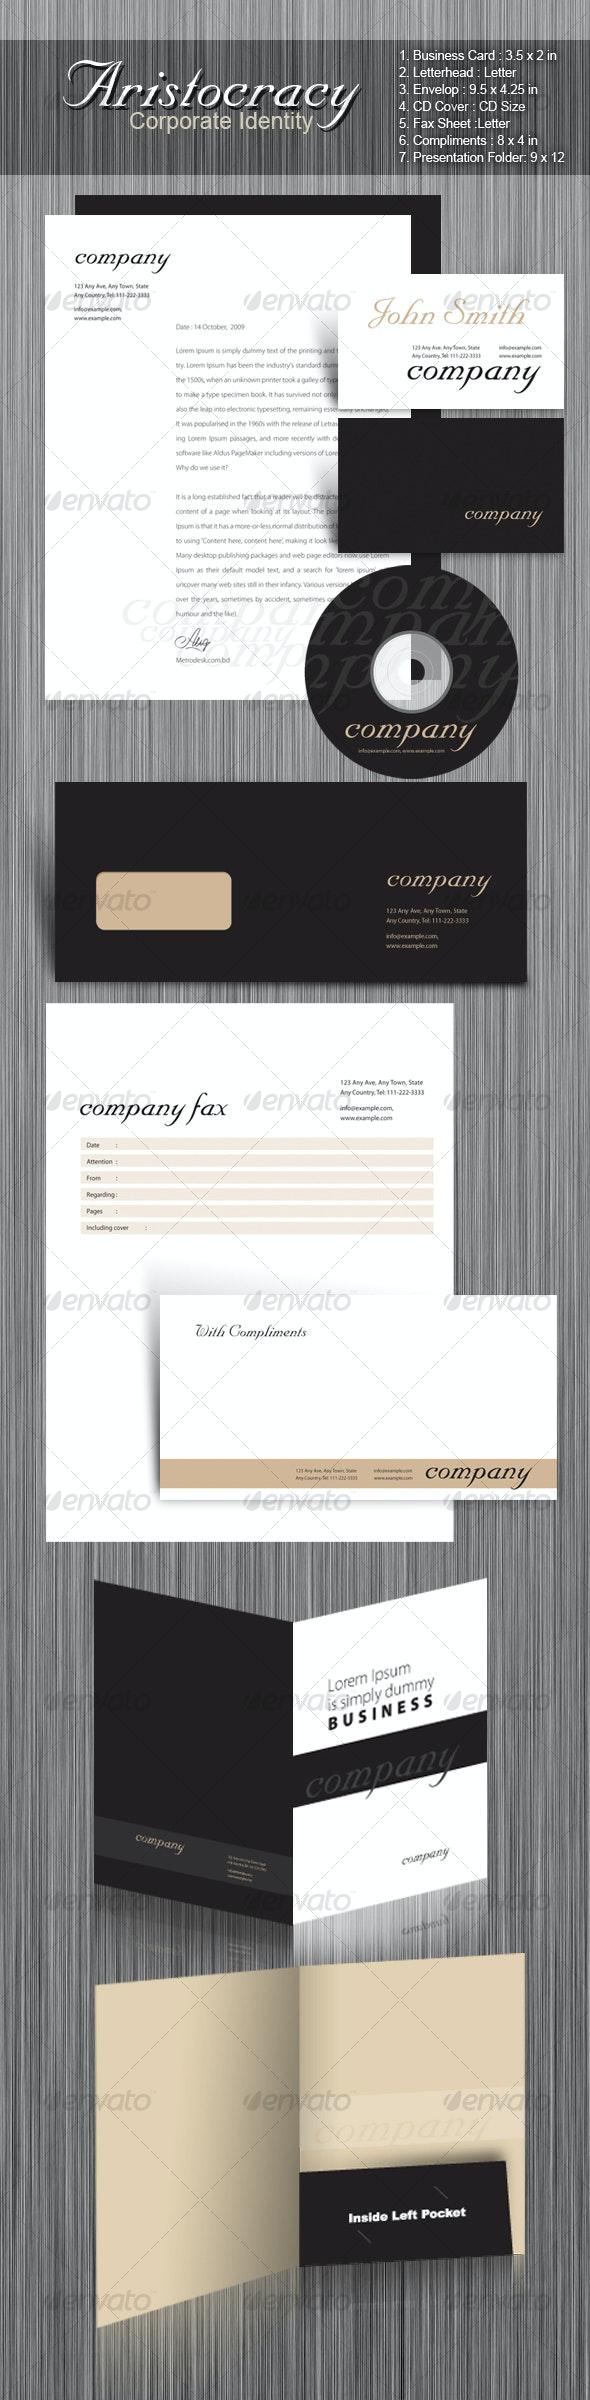 Aristocracy Corporate Identity - Stationery Print Templates